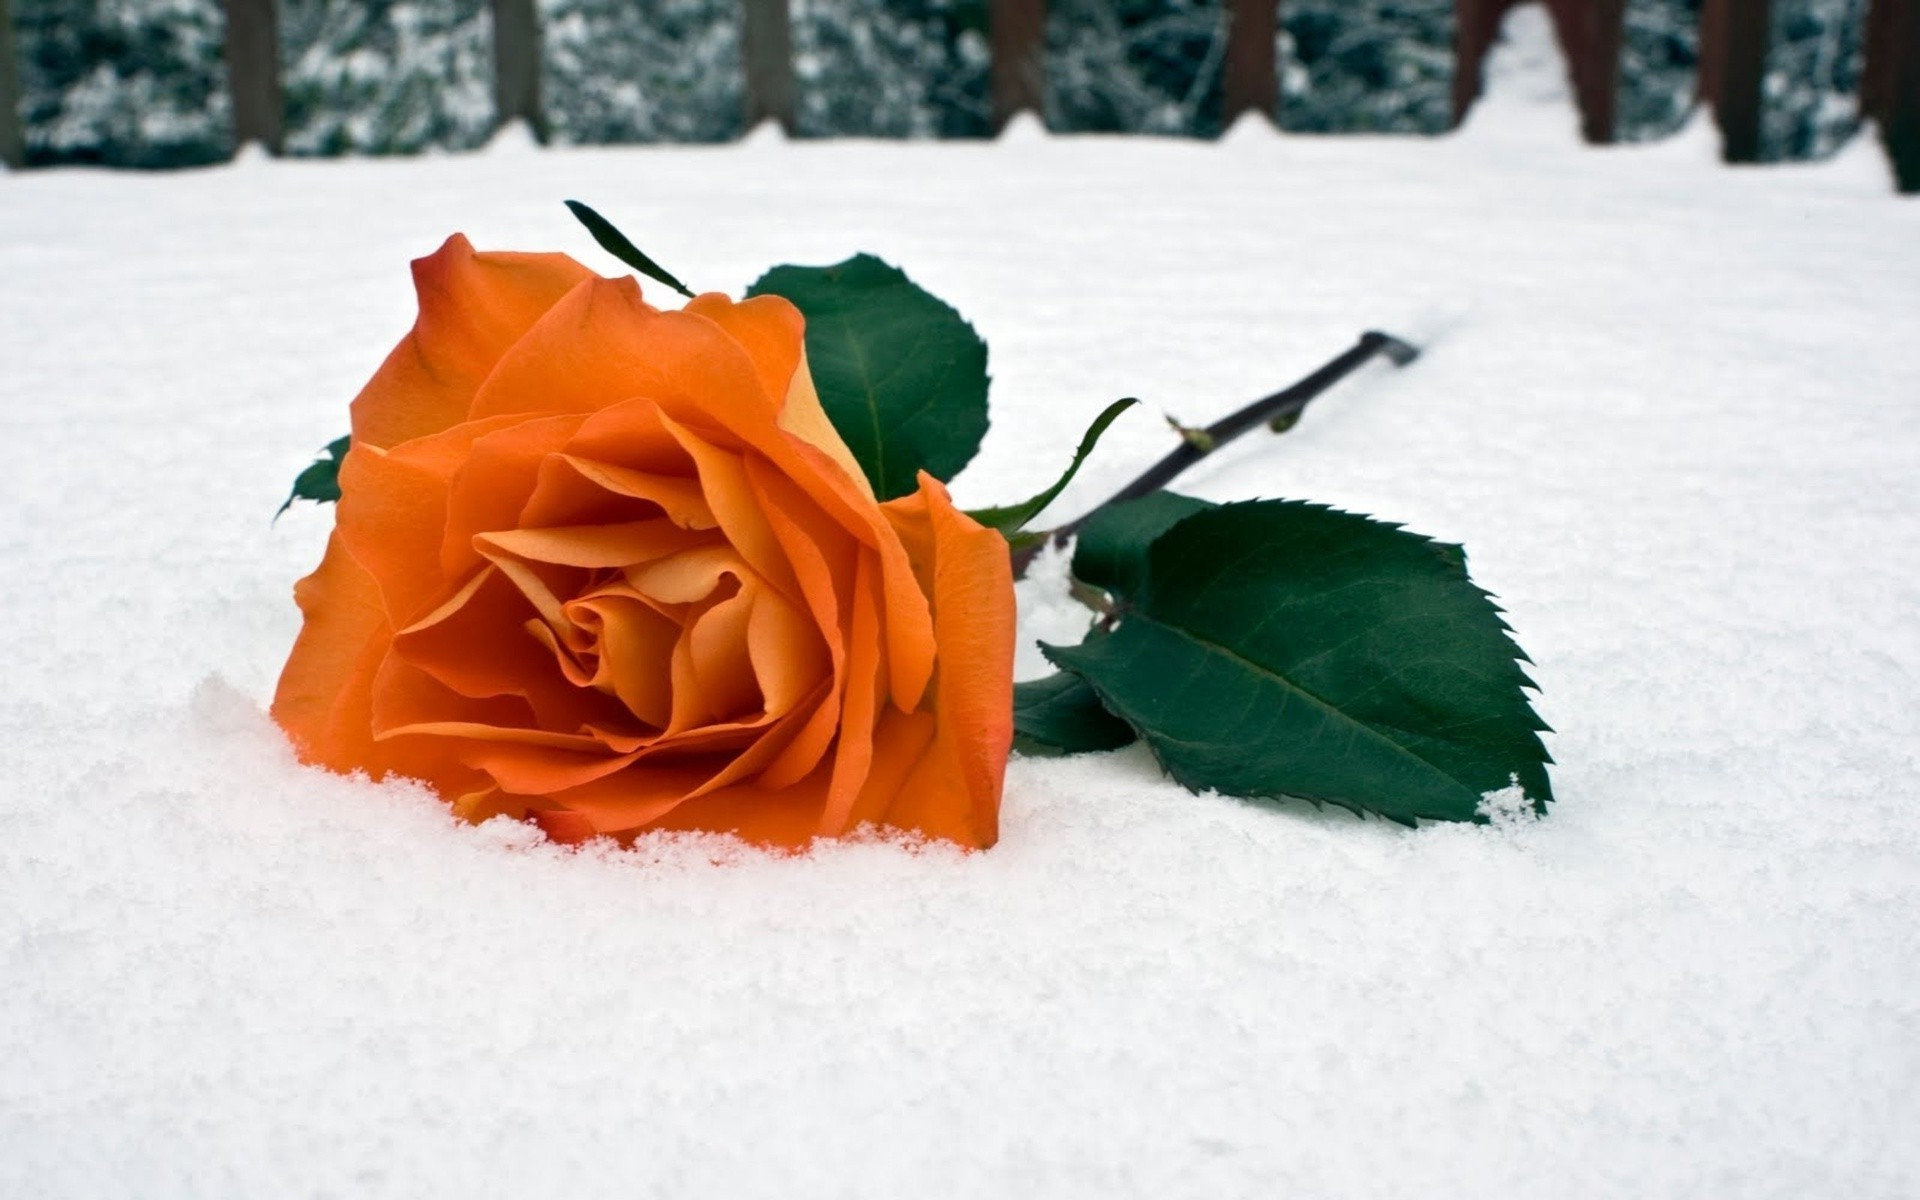 Доставка цветов, букет цветов на снегу в темноте